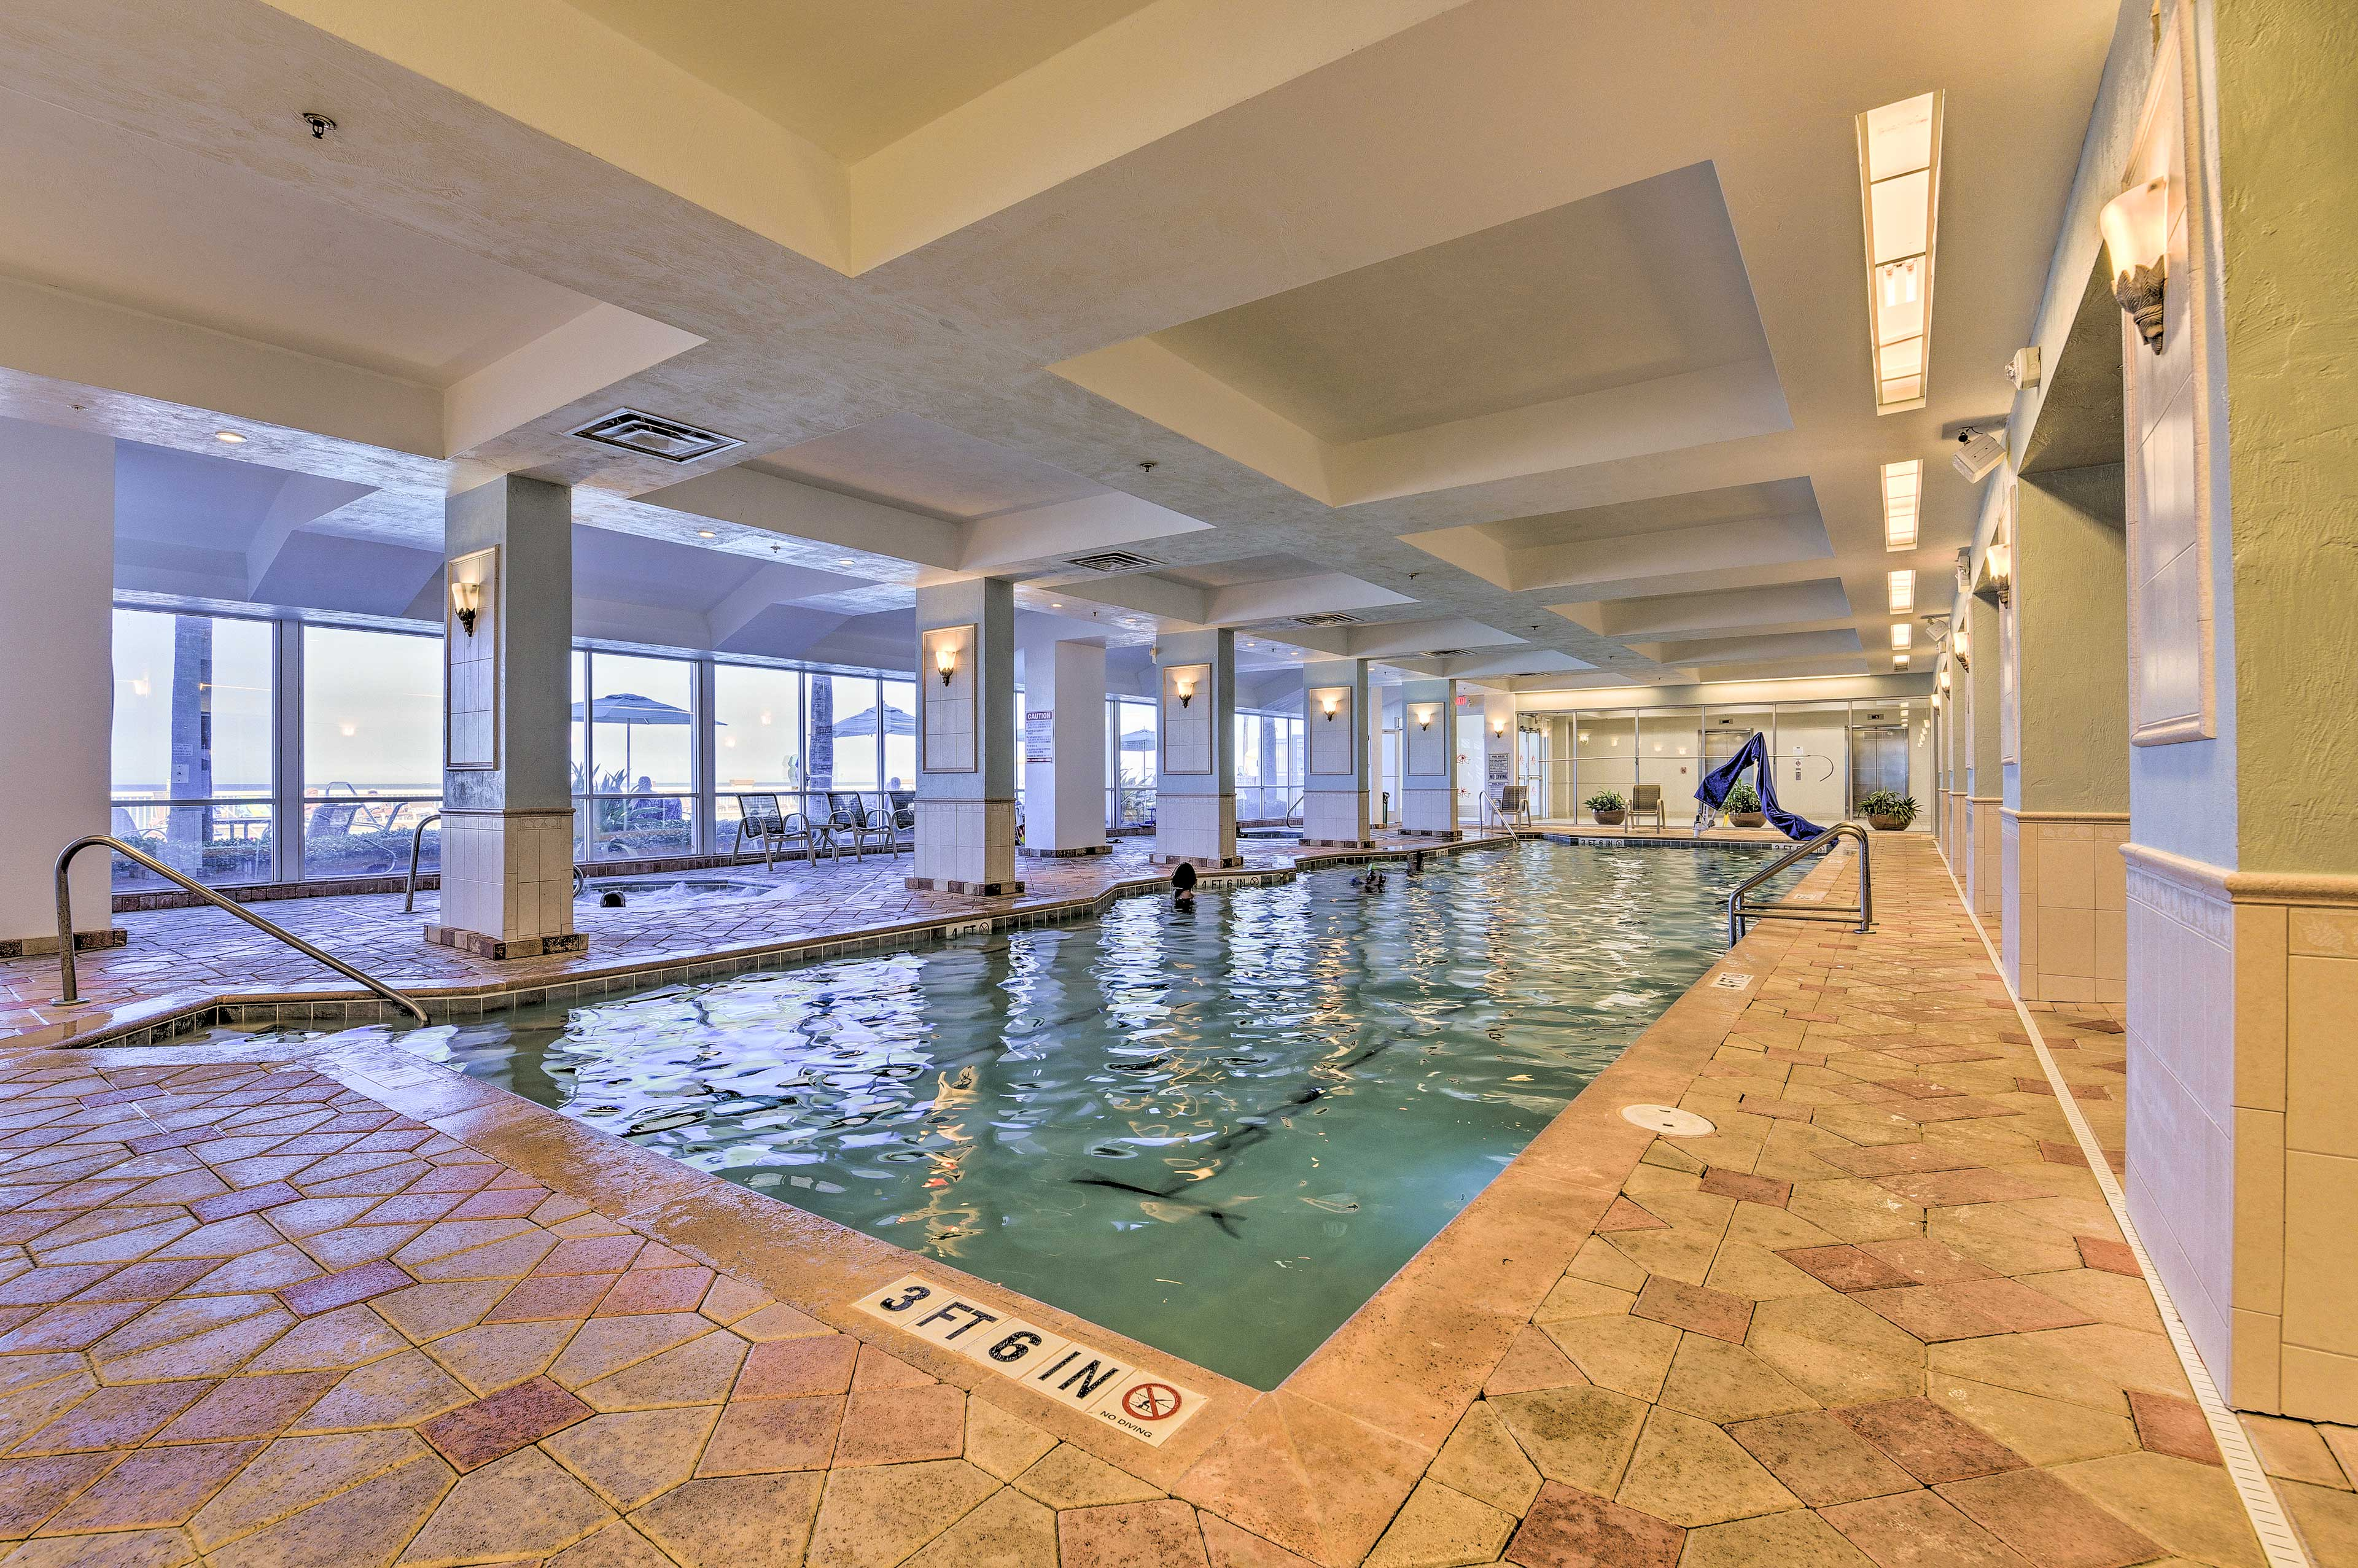 Swim laps or splash around with the kids in the pool!